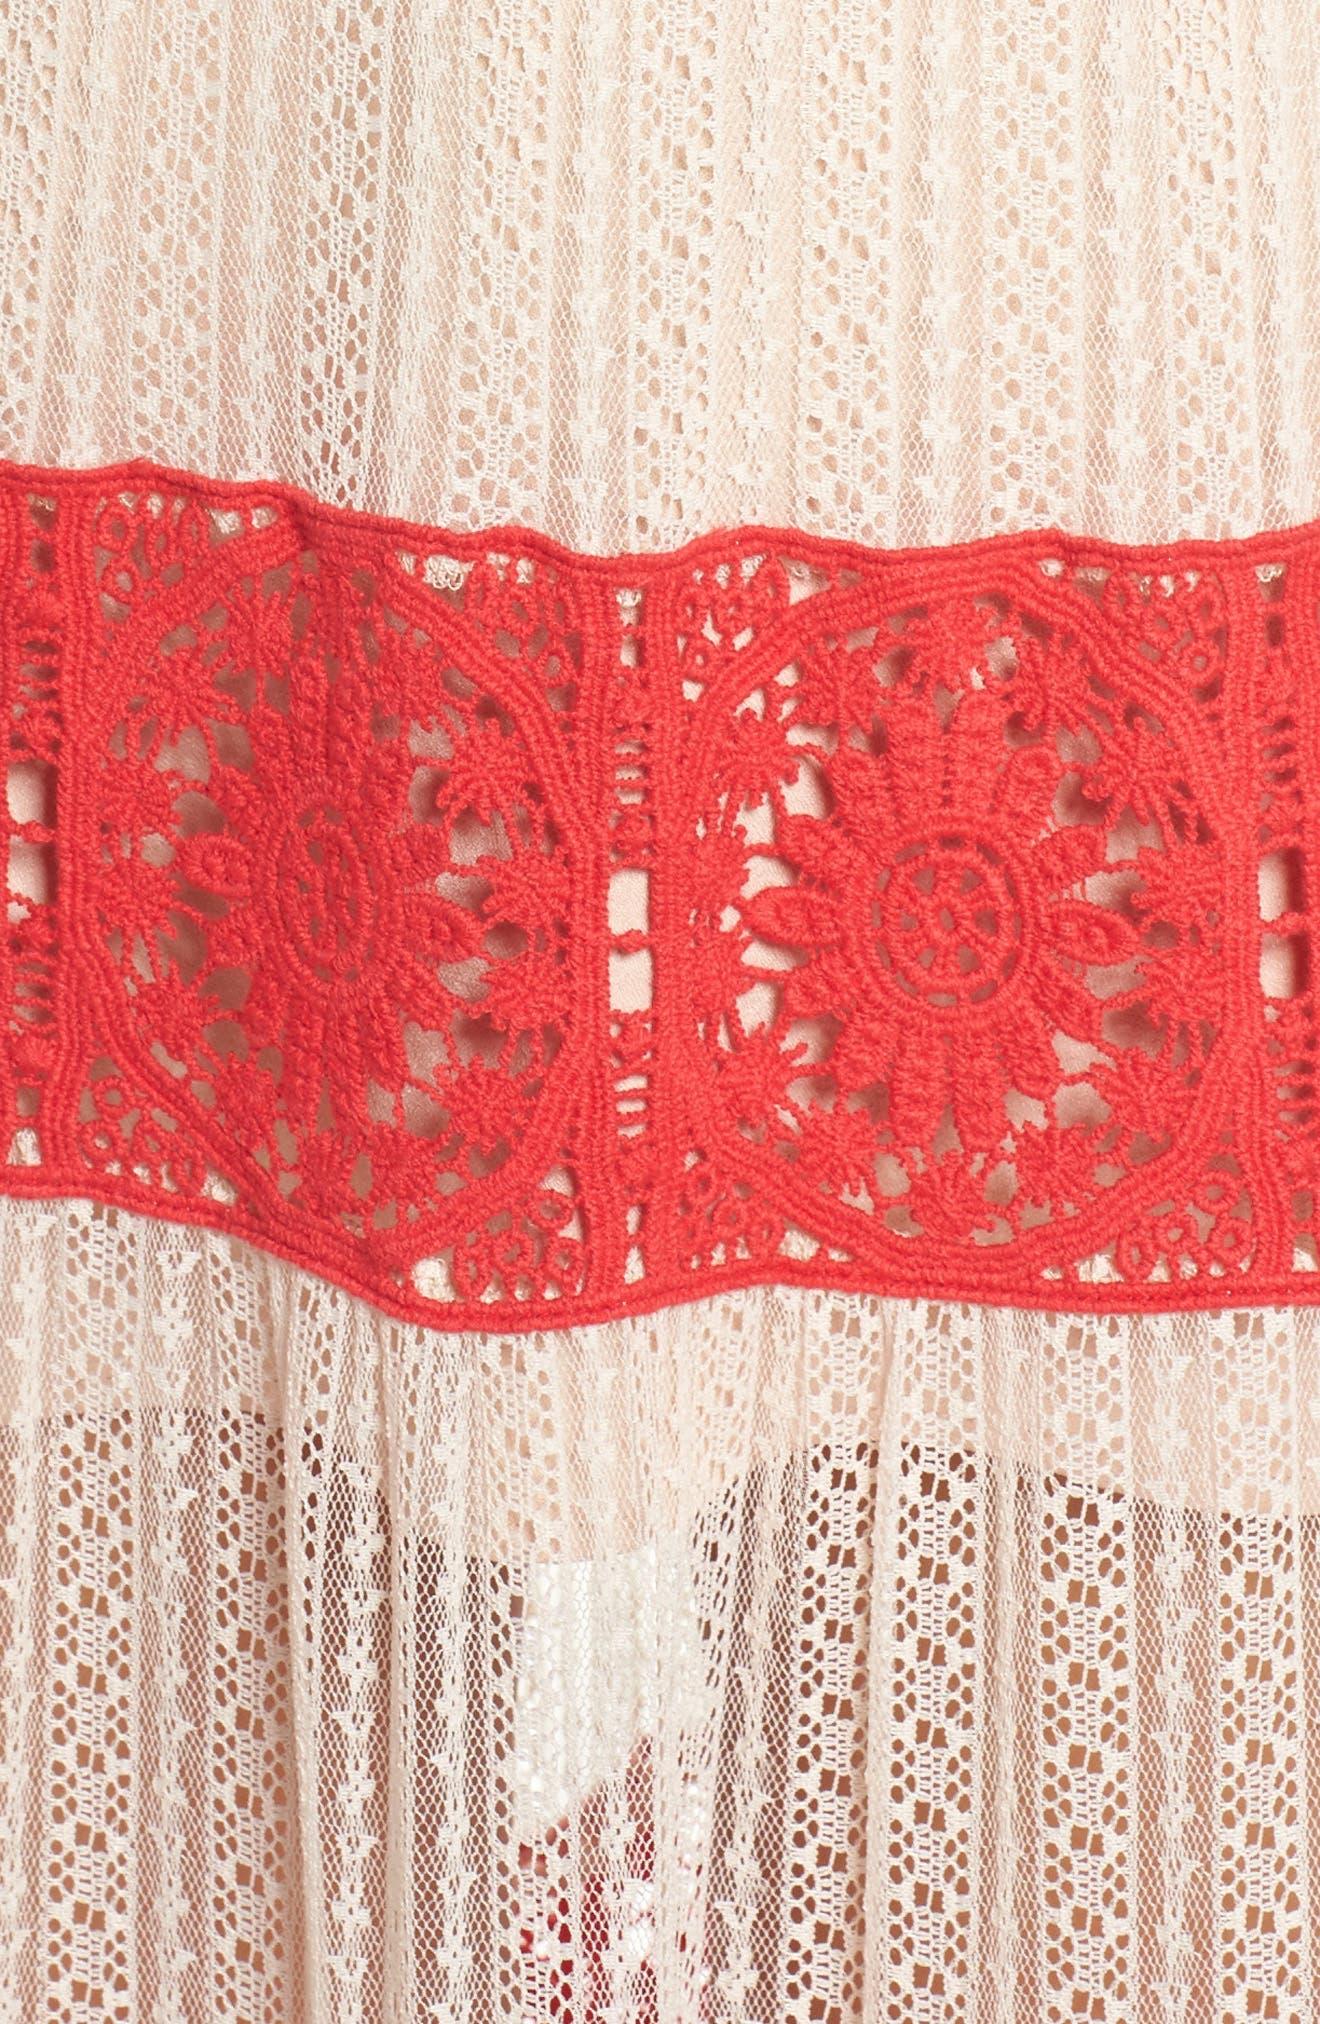 Ophelia Two-Tone Lace Maxi Dress,                             Alternate thumbnail 6, color,                             250